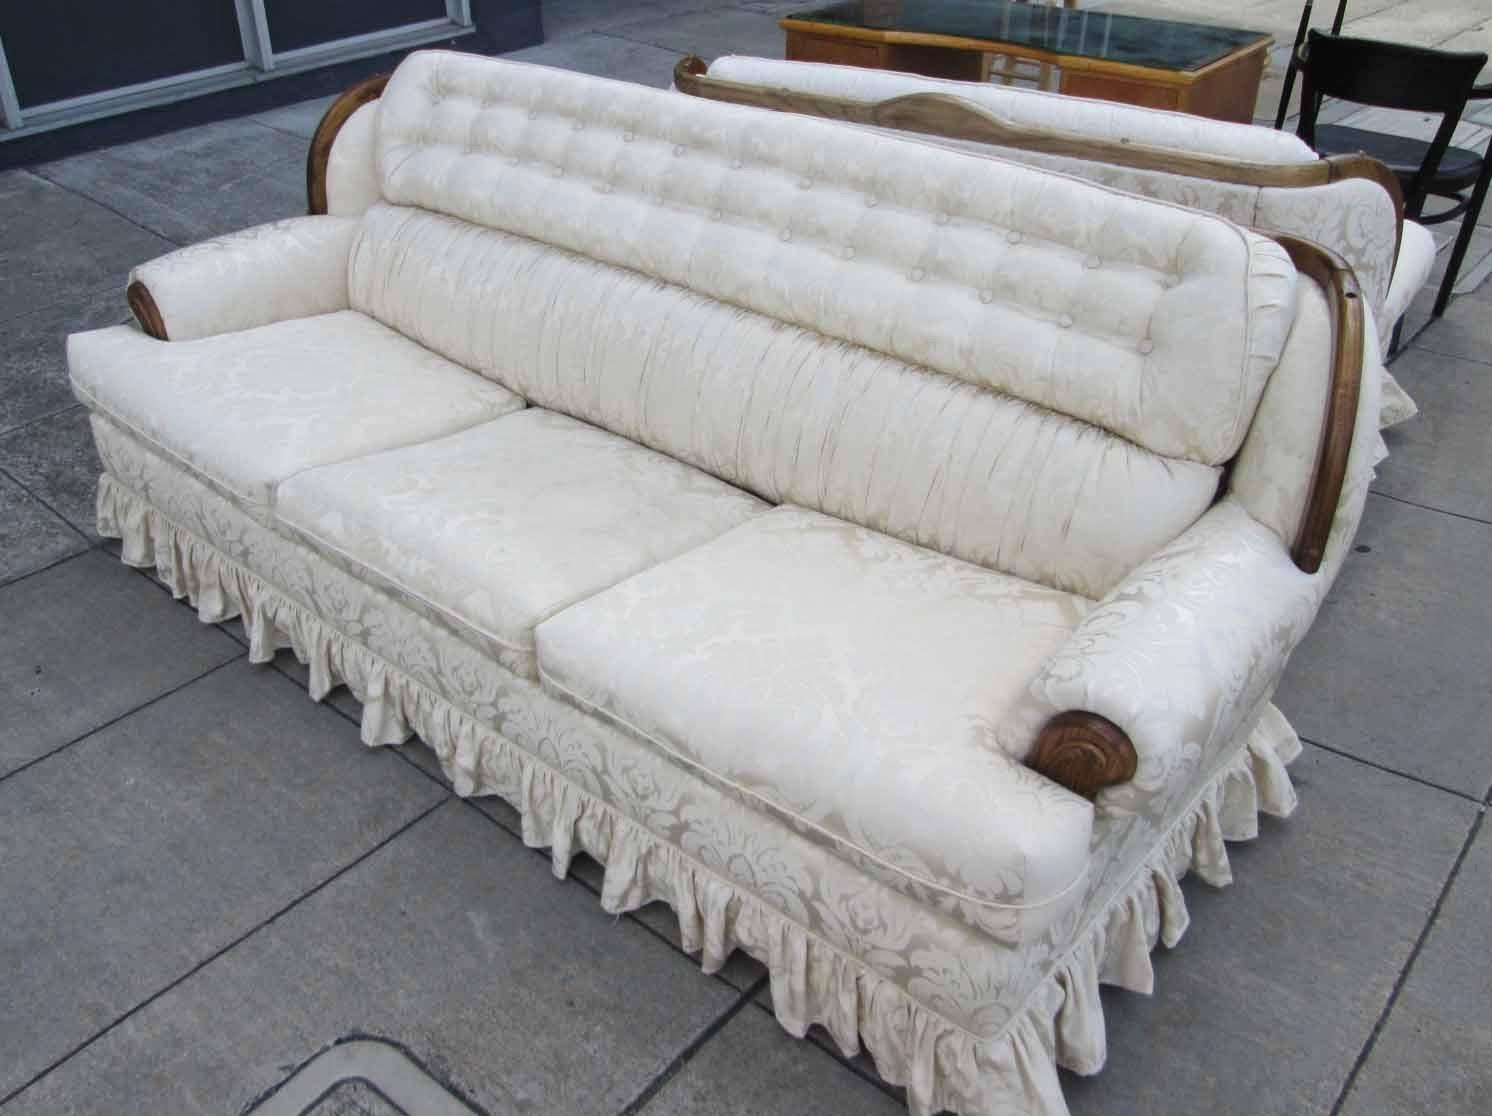 Early American Style Sofas Sofa Chair Toronto Uhuru Furniture Collectibles Sold Sleeper 95